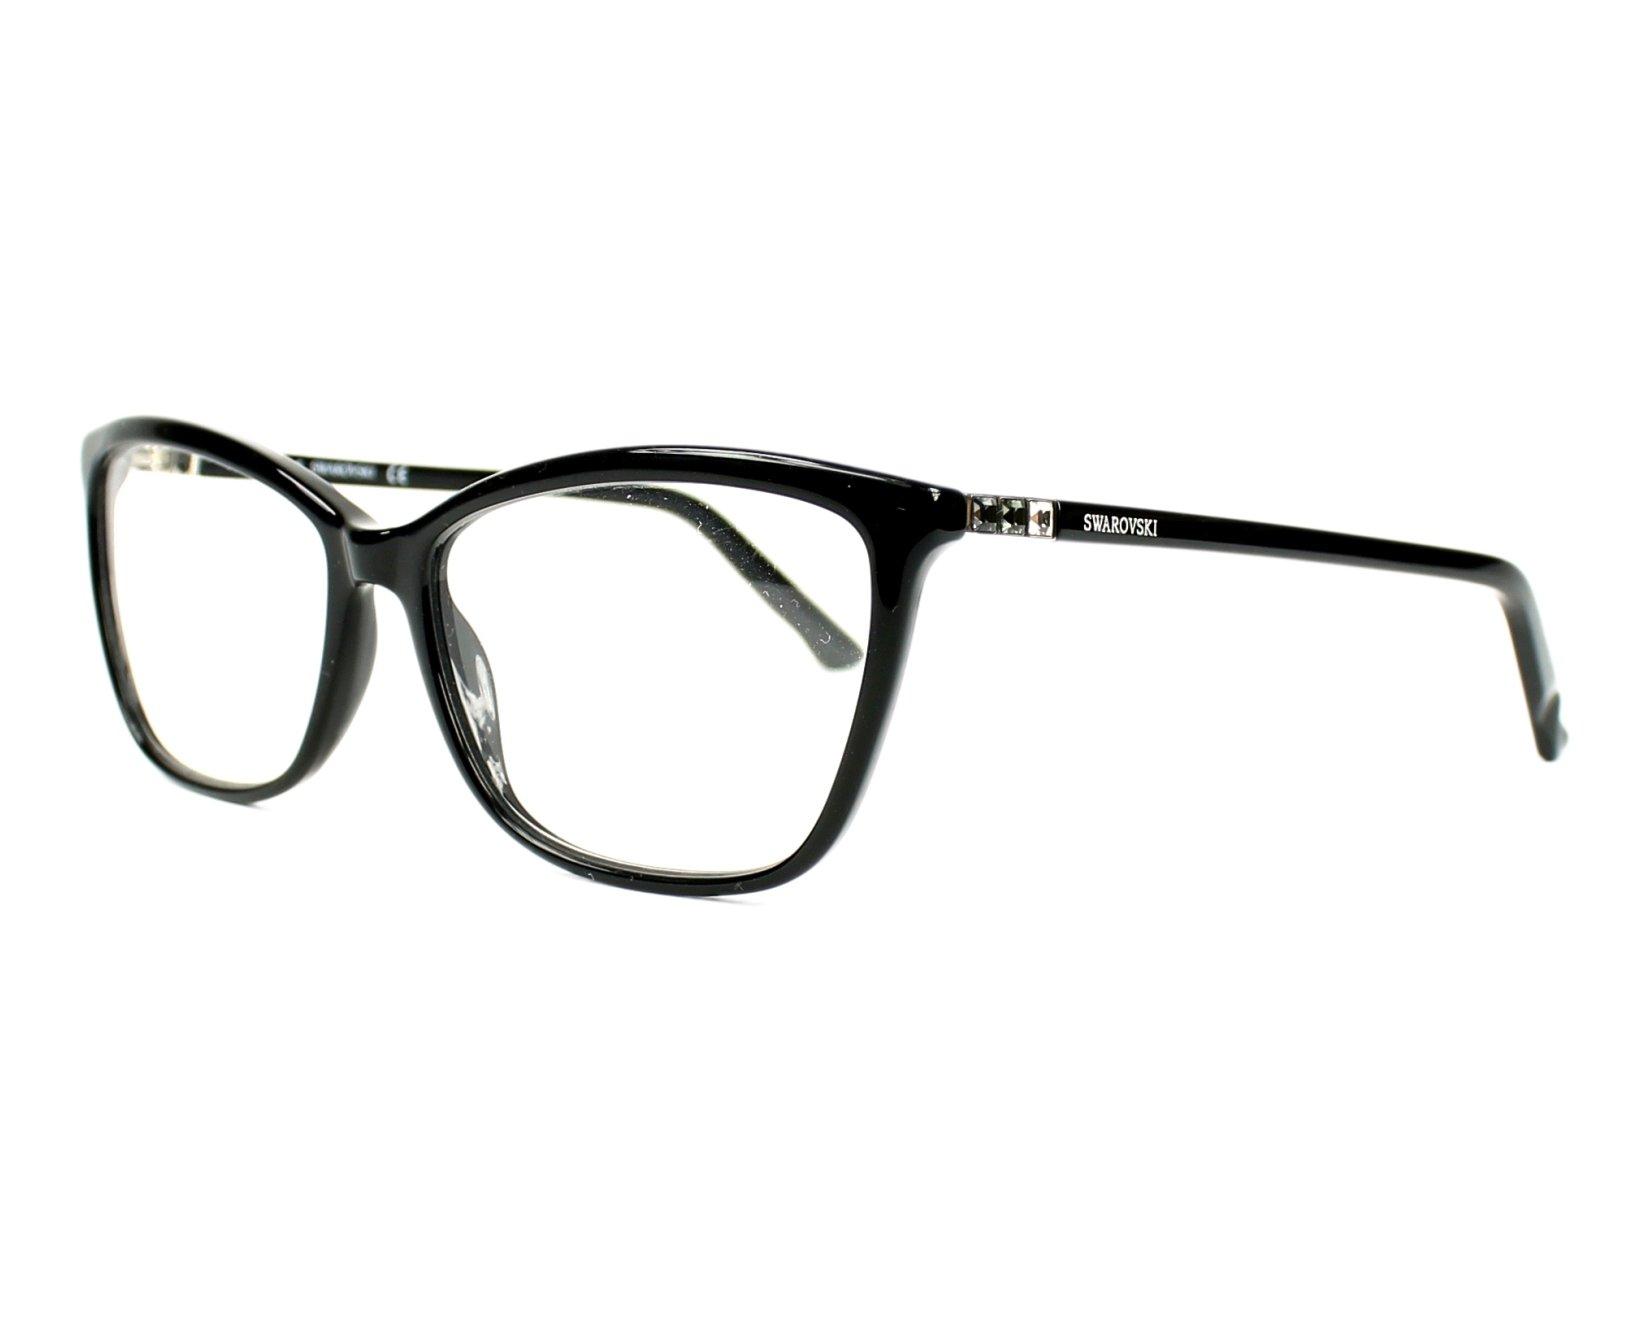 a0252ffefb3 eyeglasses Swarovski SW-5137 001 - Black Silver profile view